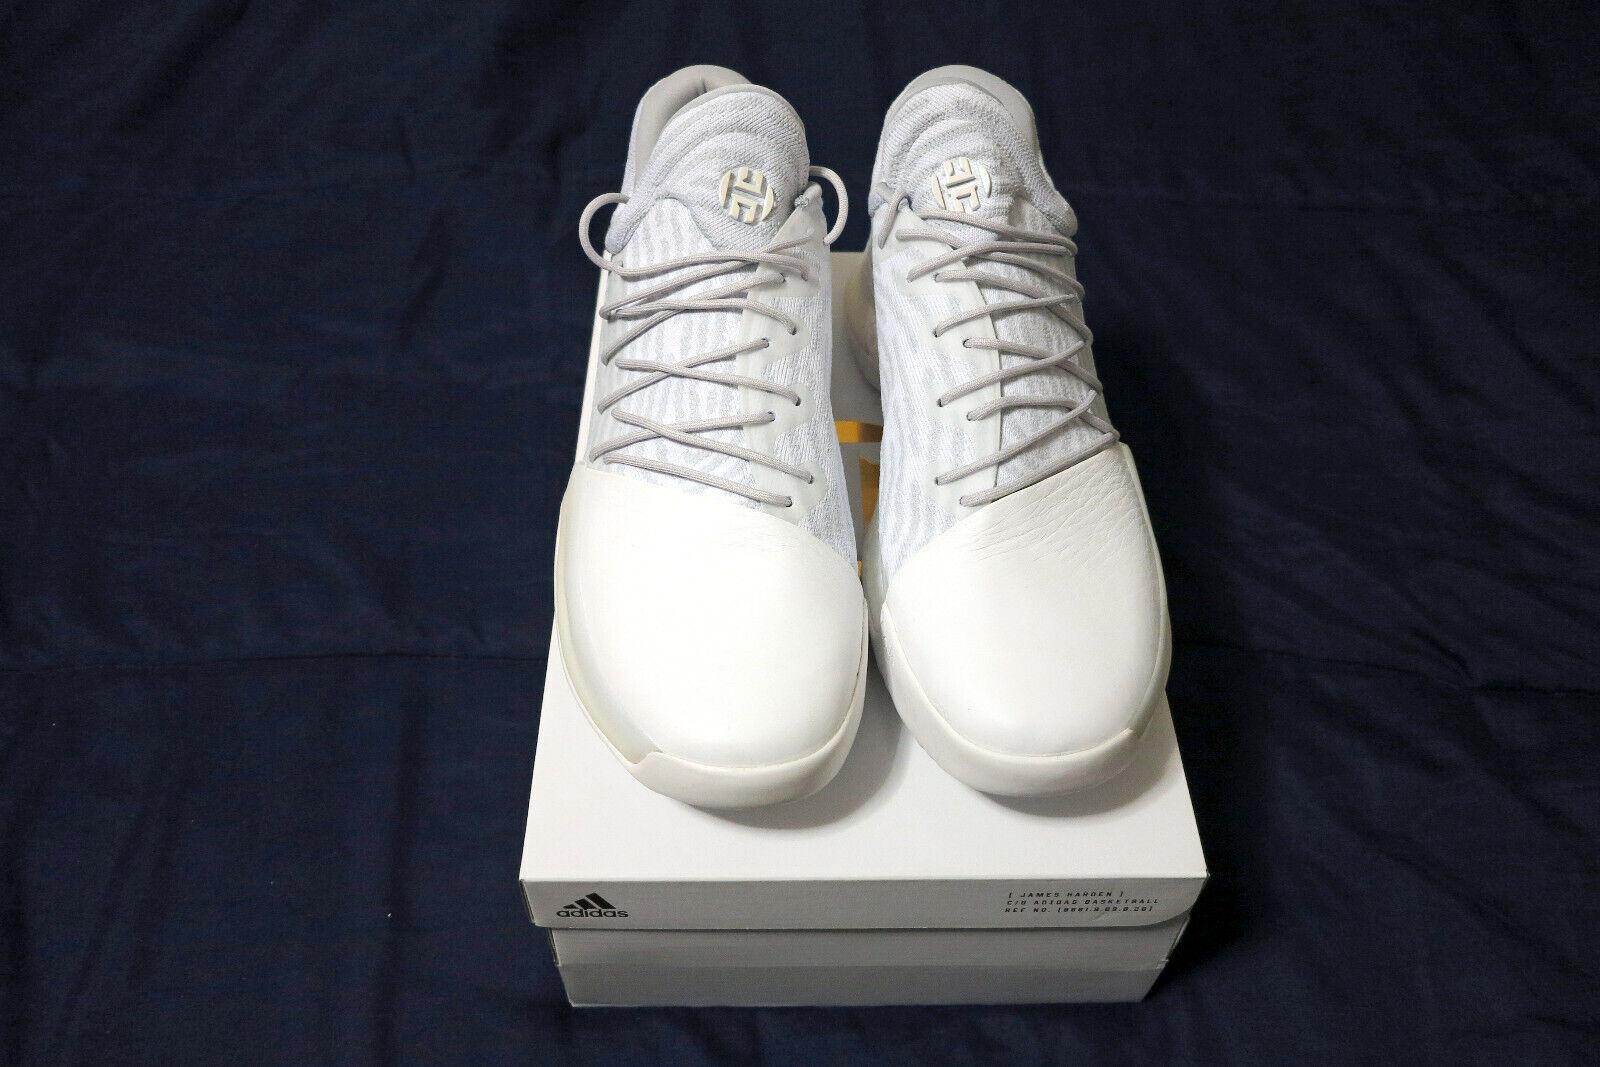 Adidas Harden Vol 1 Christmas Below Zero Brand New  Mens Sneakers Size 13